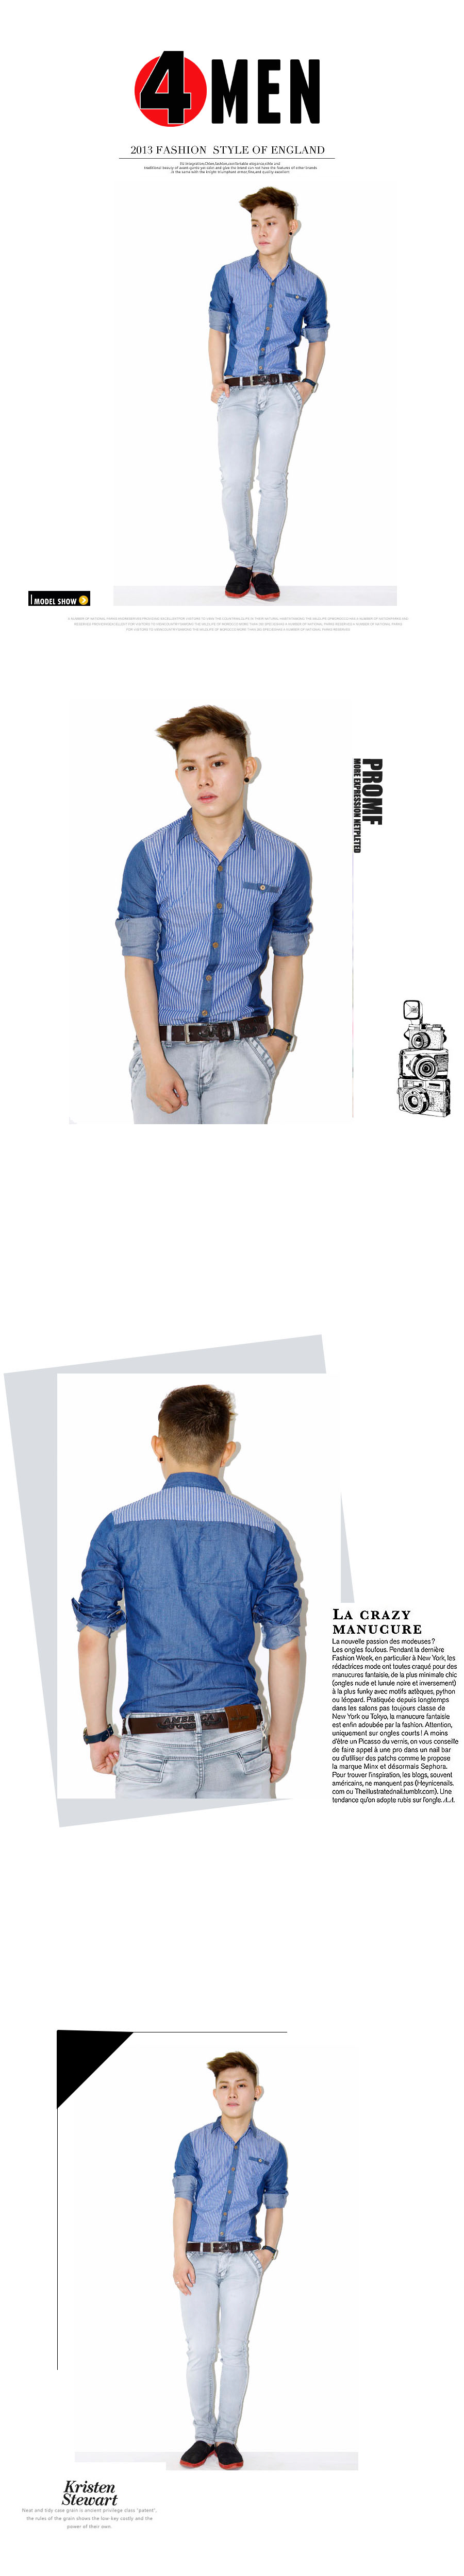 Áo sơ mi jean sọc xanh asm1054 - 1